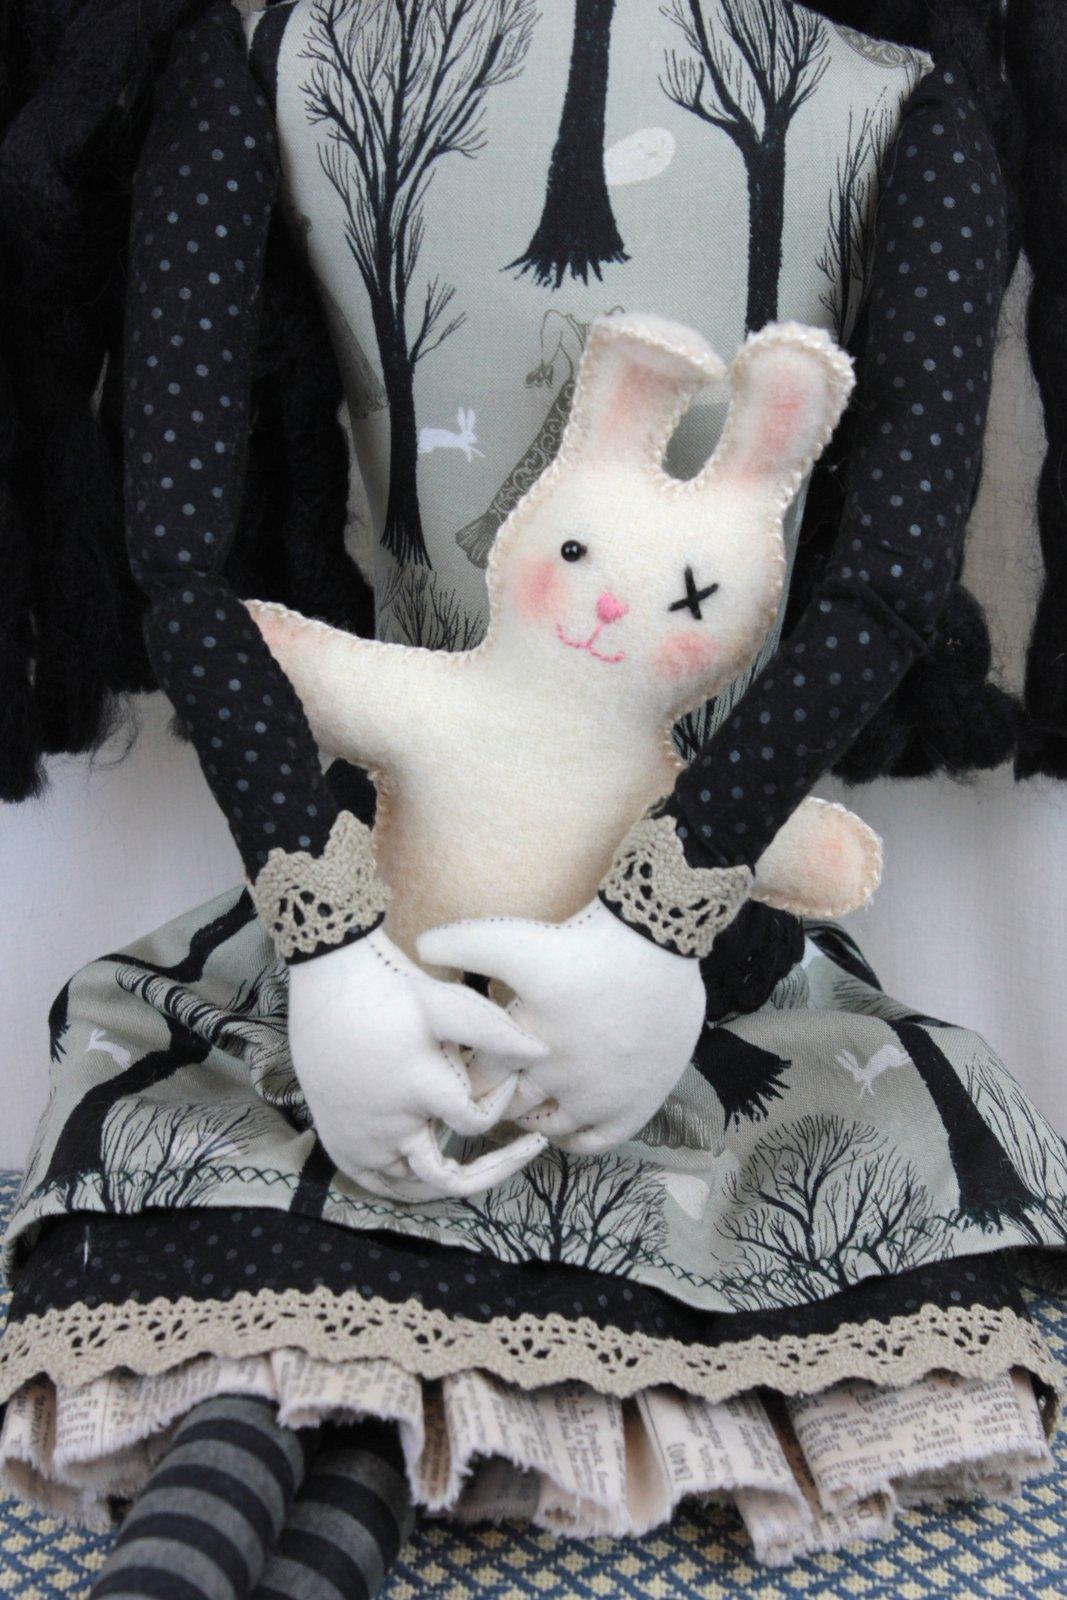 Edwina (detail of her bunny)